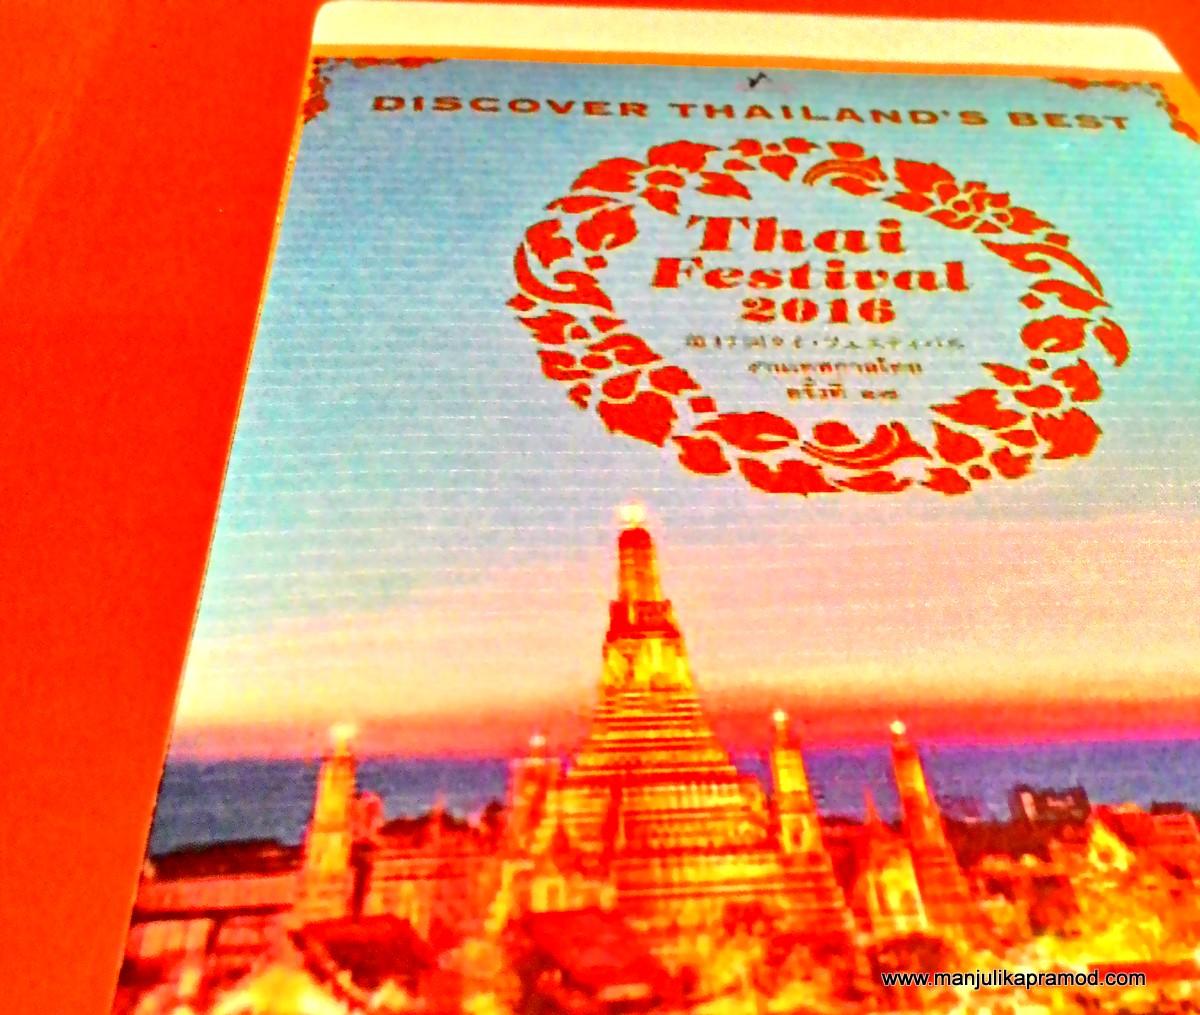 Sawadika, Thai Food Festival,ITC Sheraton, Saket, Delhi, Food blogger